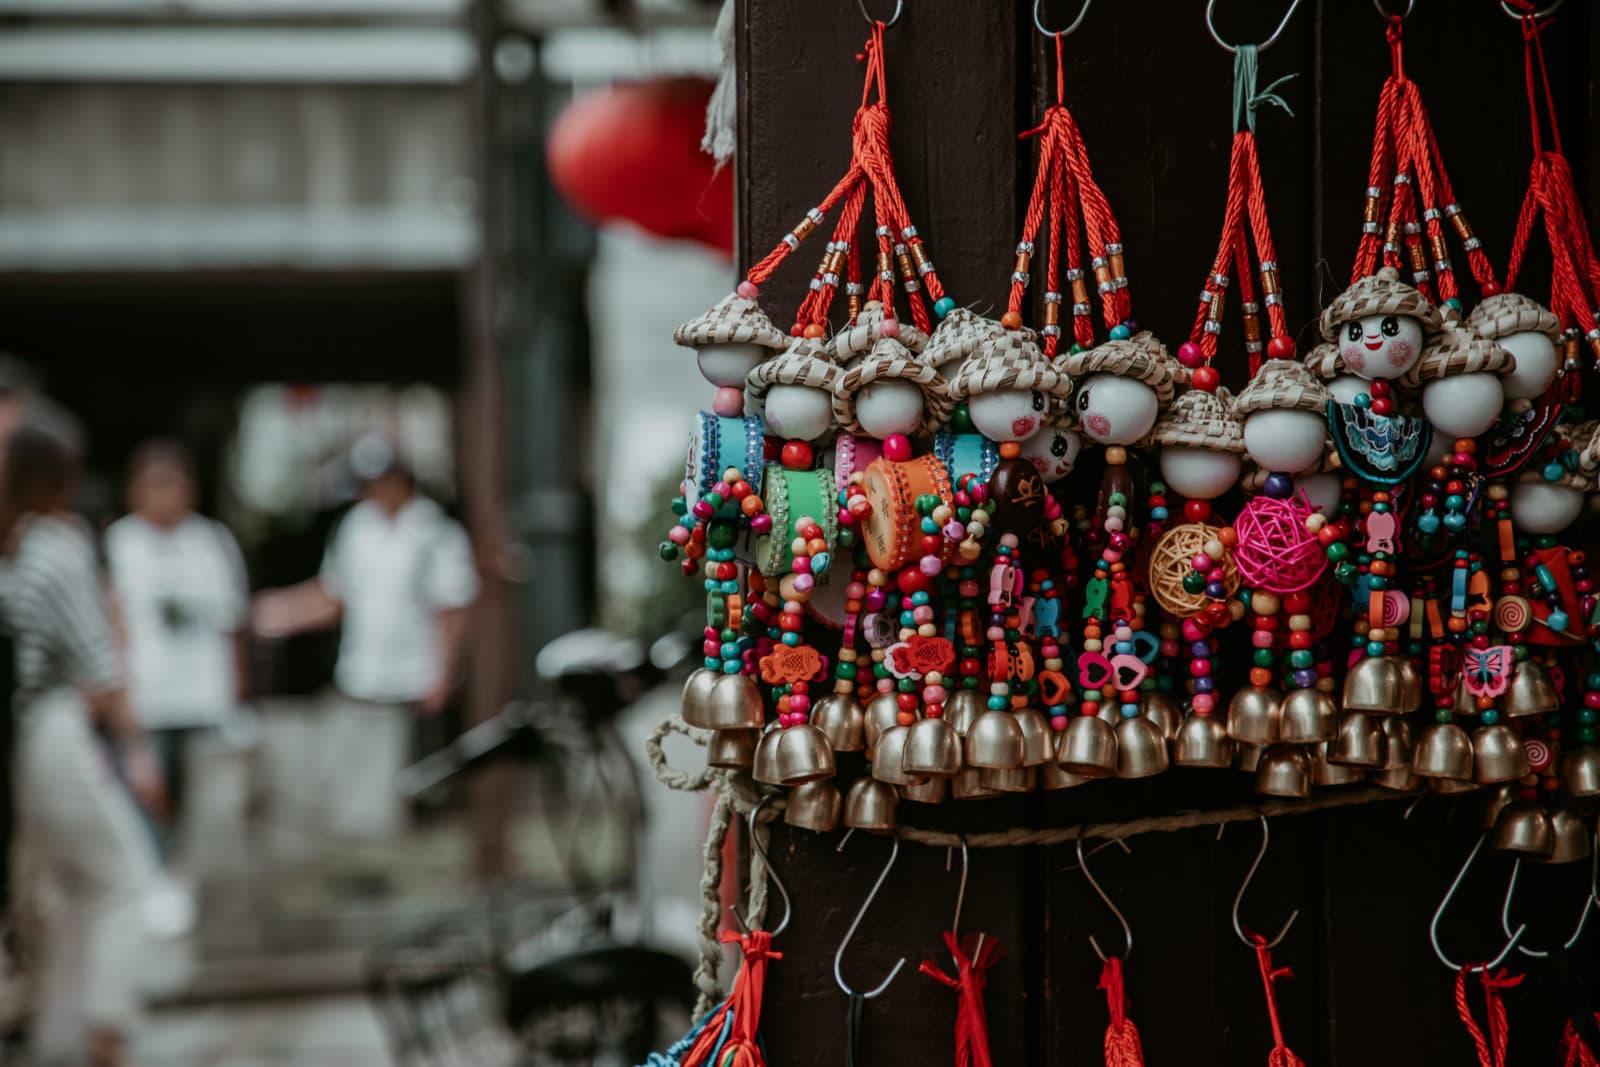 Shantang Street Suzhou Souvenirs kaufen